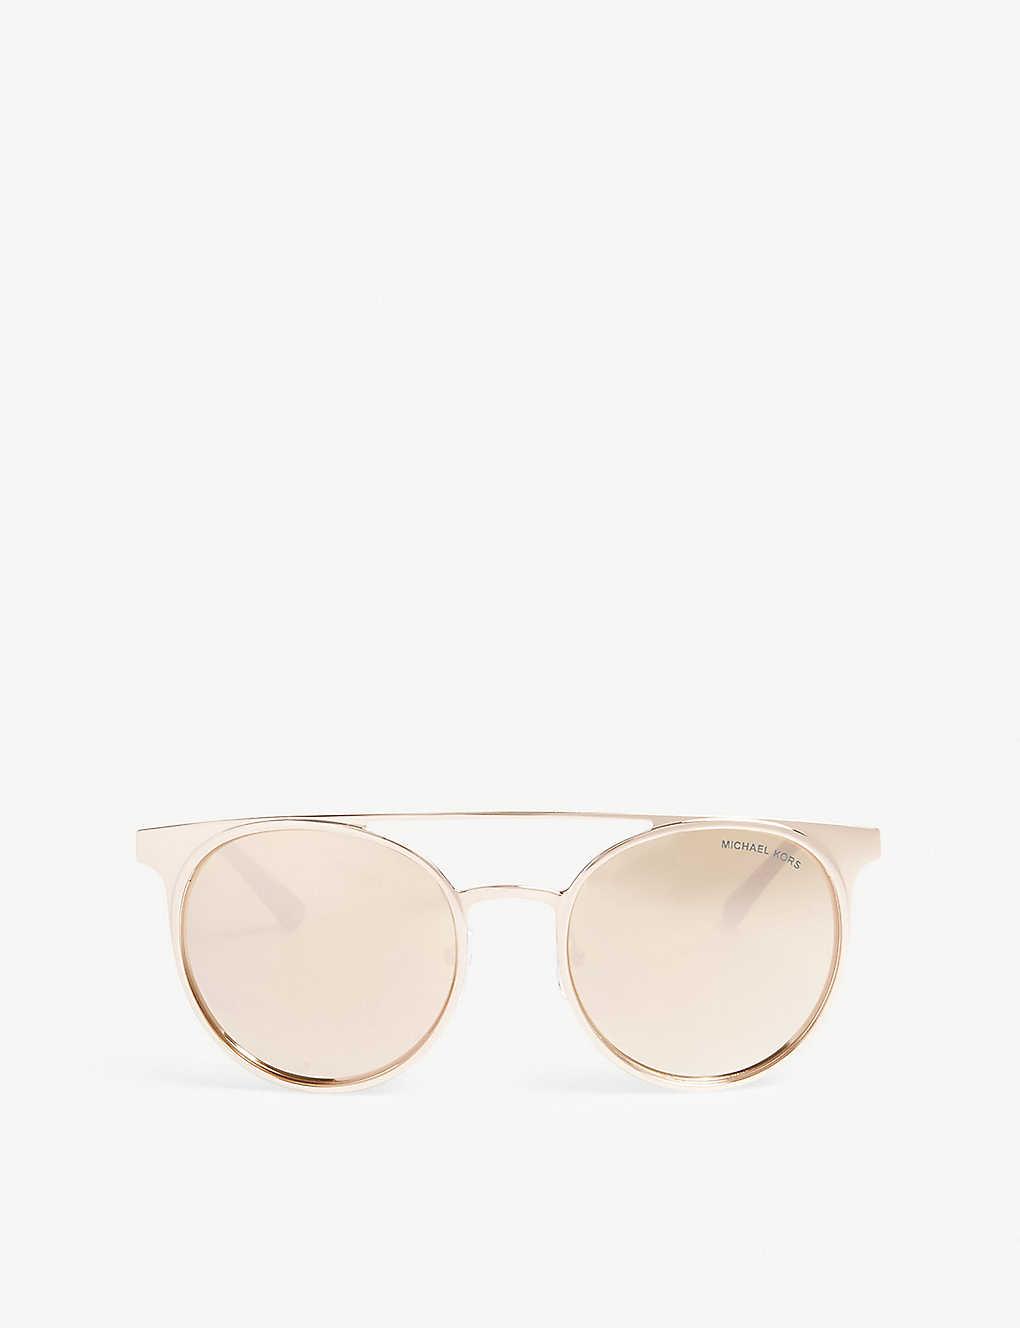 5b140e215ed1 MICHAEL KORS - Grayton round-frame sunglasses | Selfridges.com